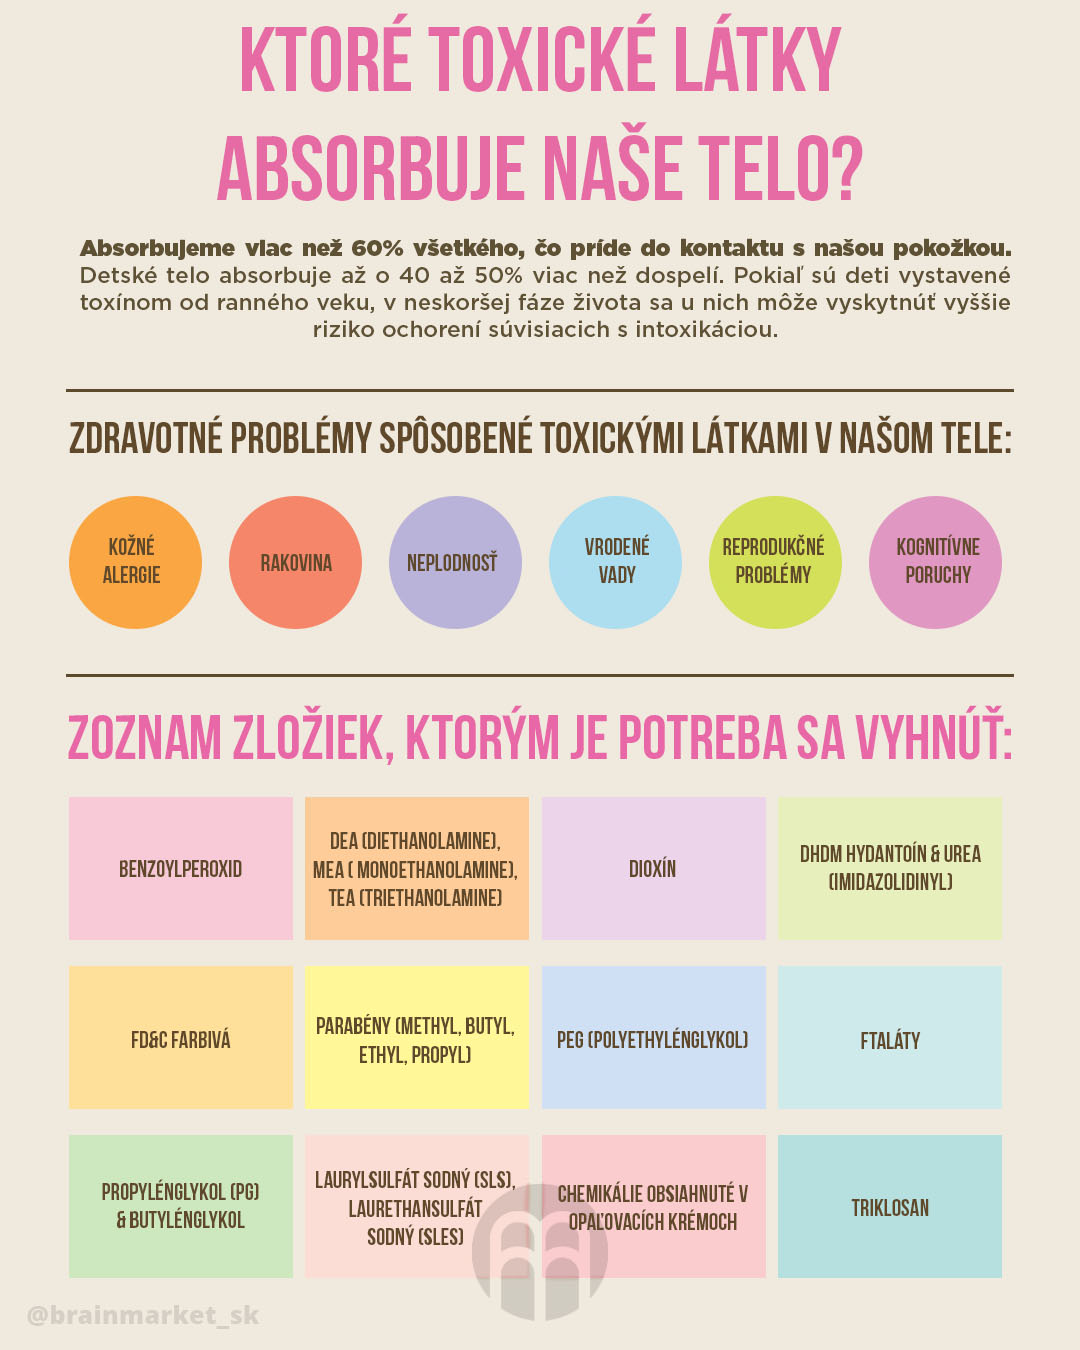 ktere-toxicke-latky-absorbuje-telo-infografika-brainmarket-sk